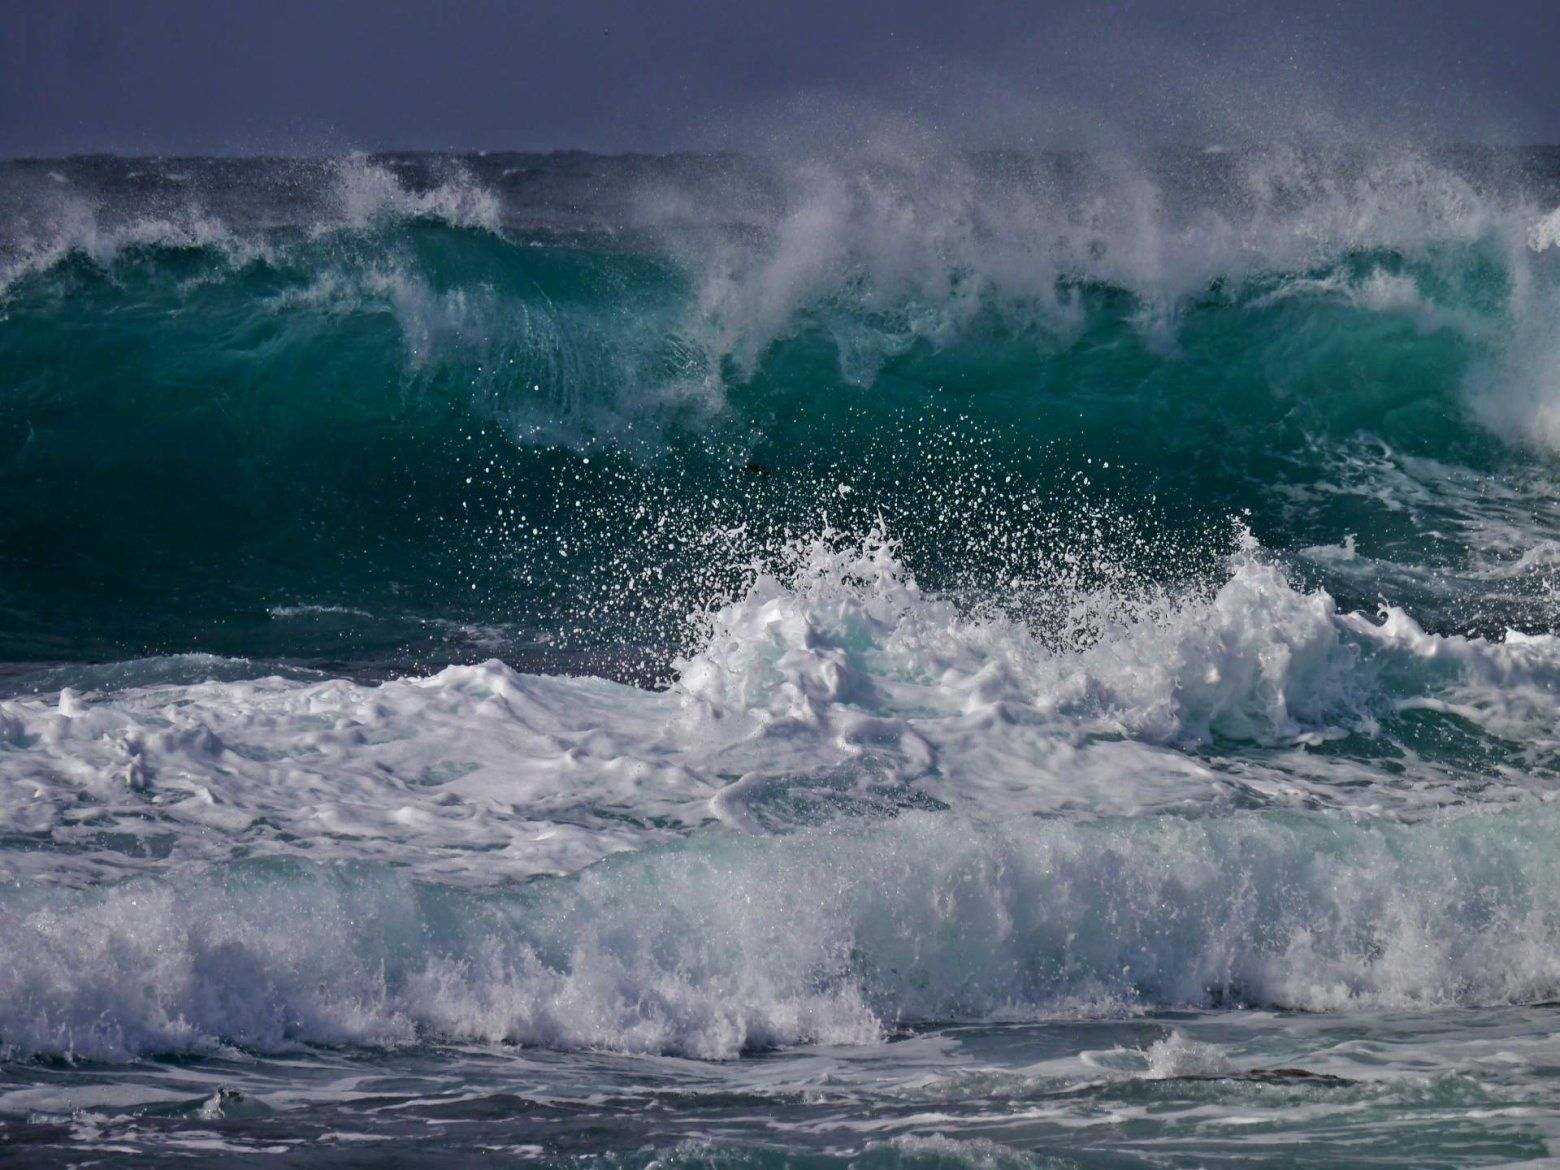 Beach Australia Waves, Surfing, Ocean, Waves, Big Swell, large Waves, Surfing, Surfers, Clean Waves, Barrel, Summer,